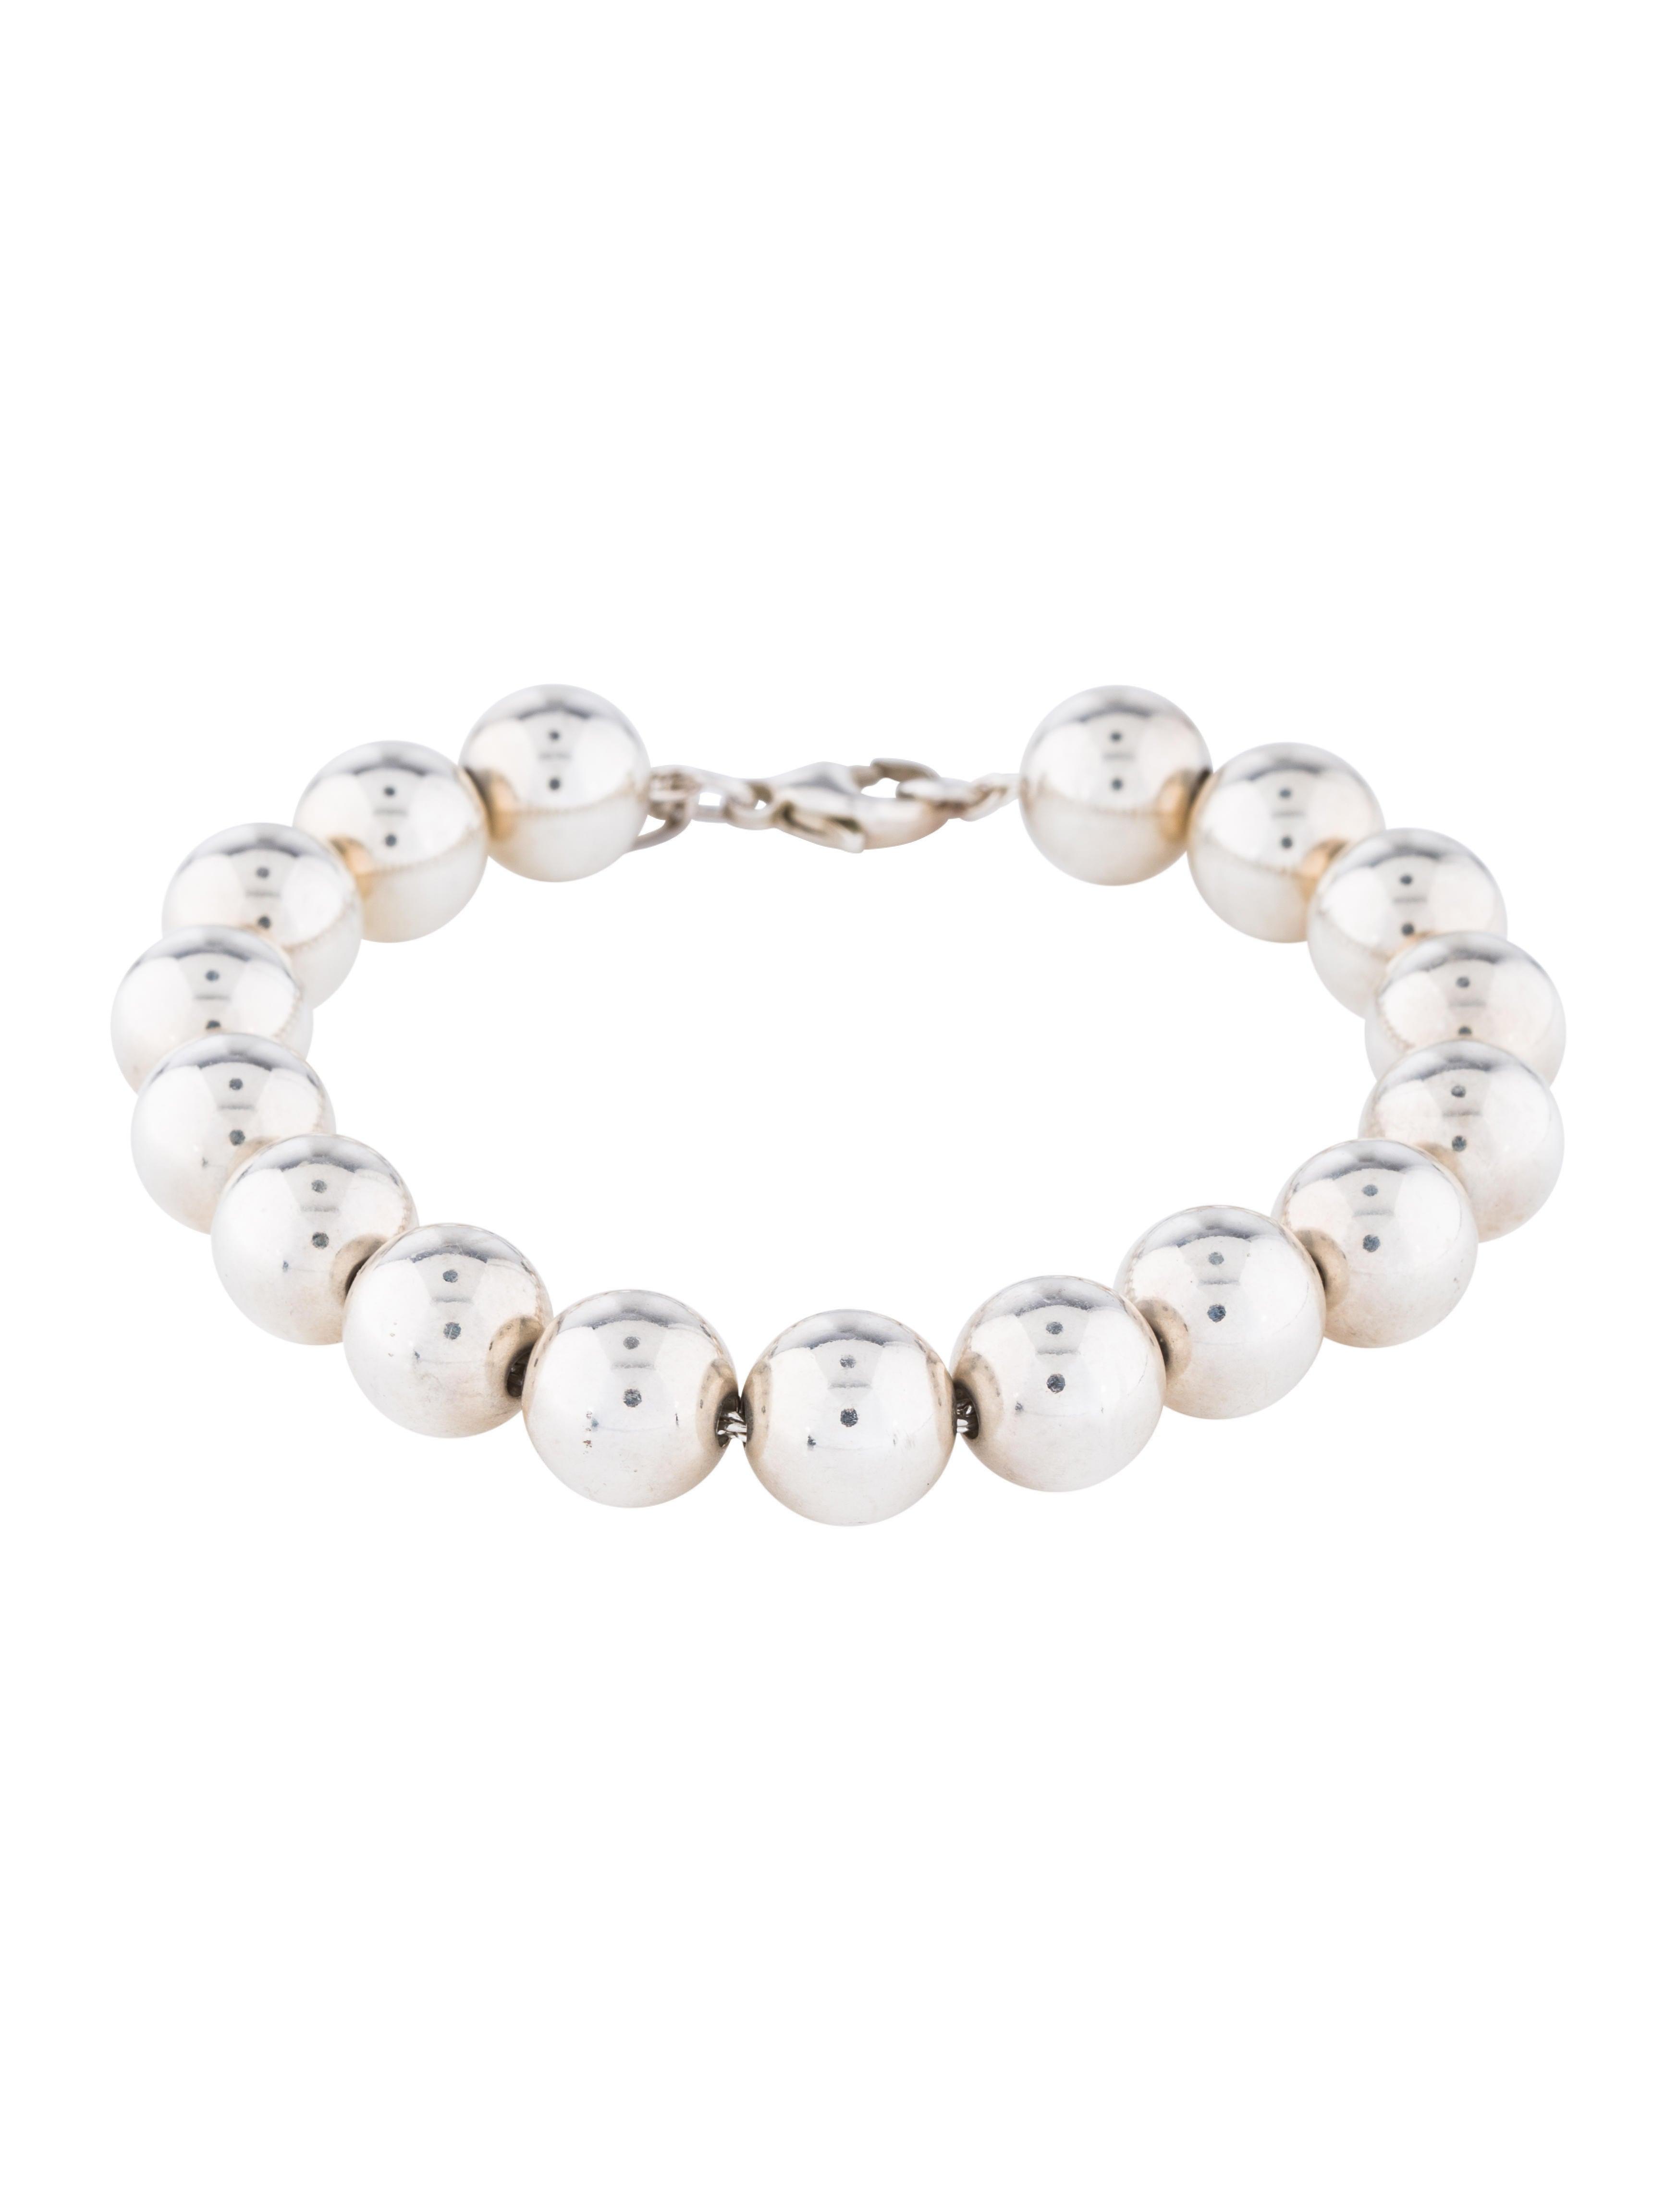 47db7944b Tiffany & Co. HardWear Ball Bracelet - Bracelets - TIF77335 | The ...